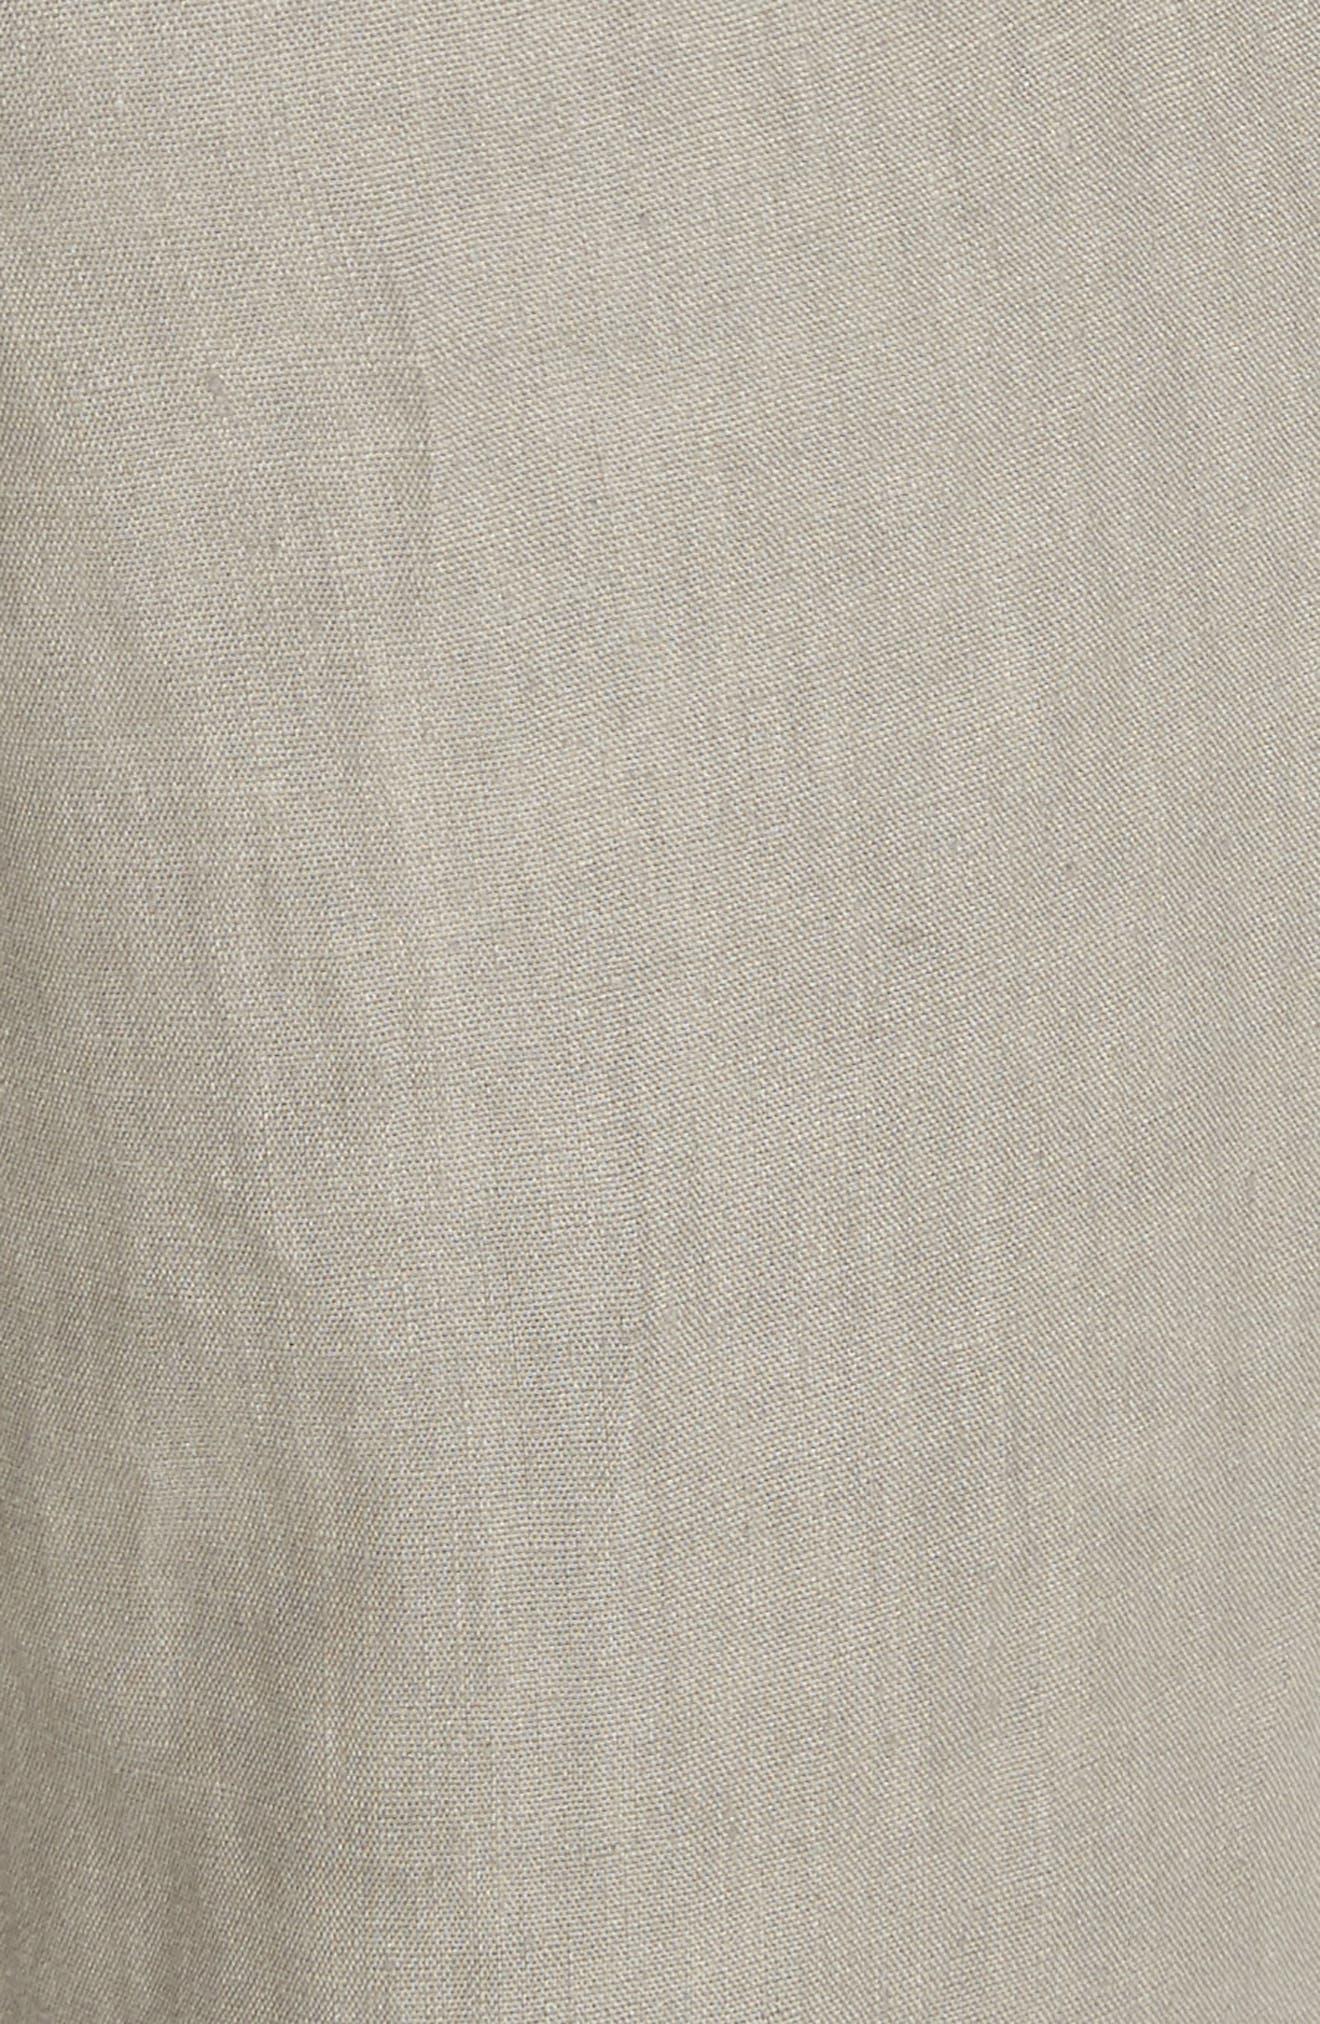 Fulton Linen Crop Pants,                             Alternate thumbnail 5, color,                             Fog